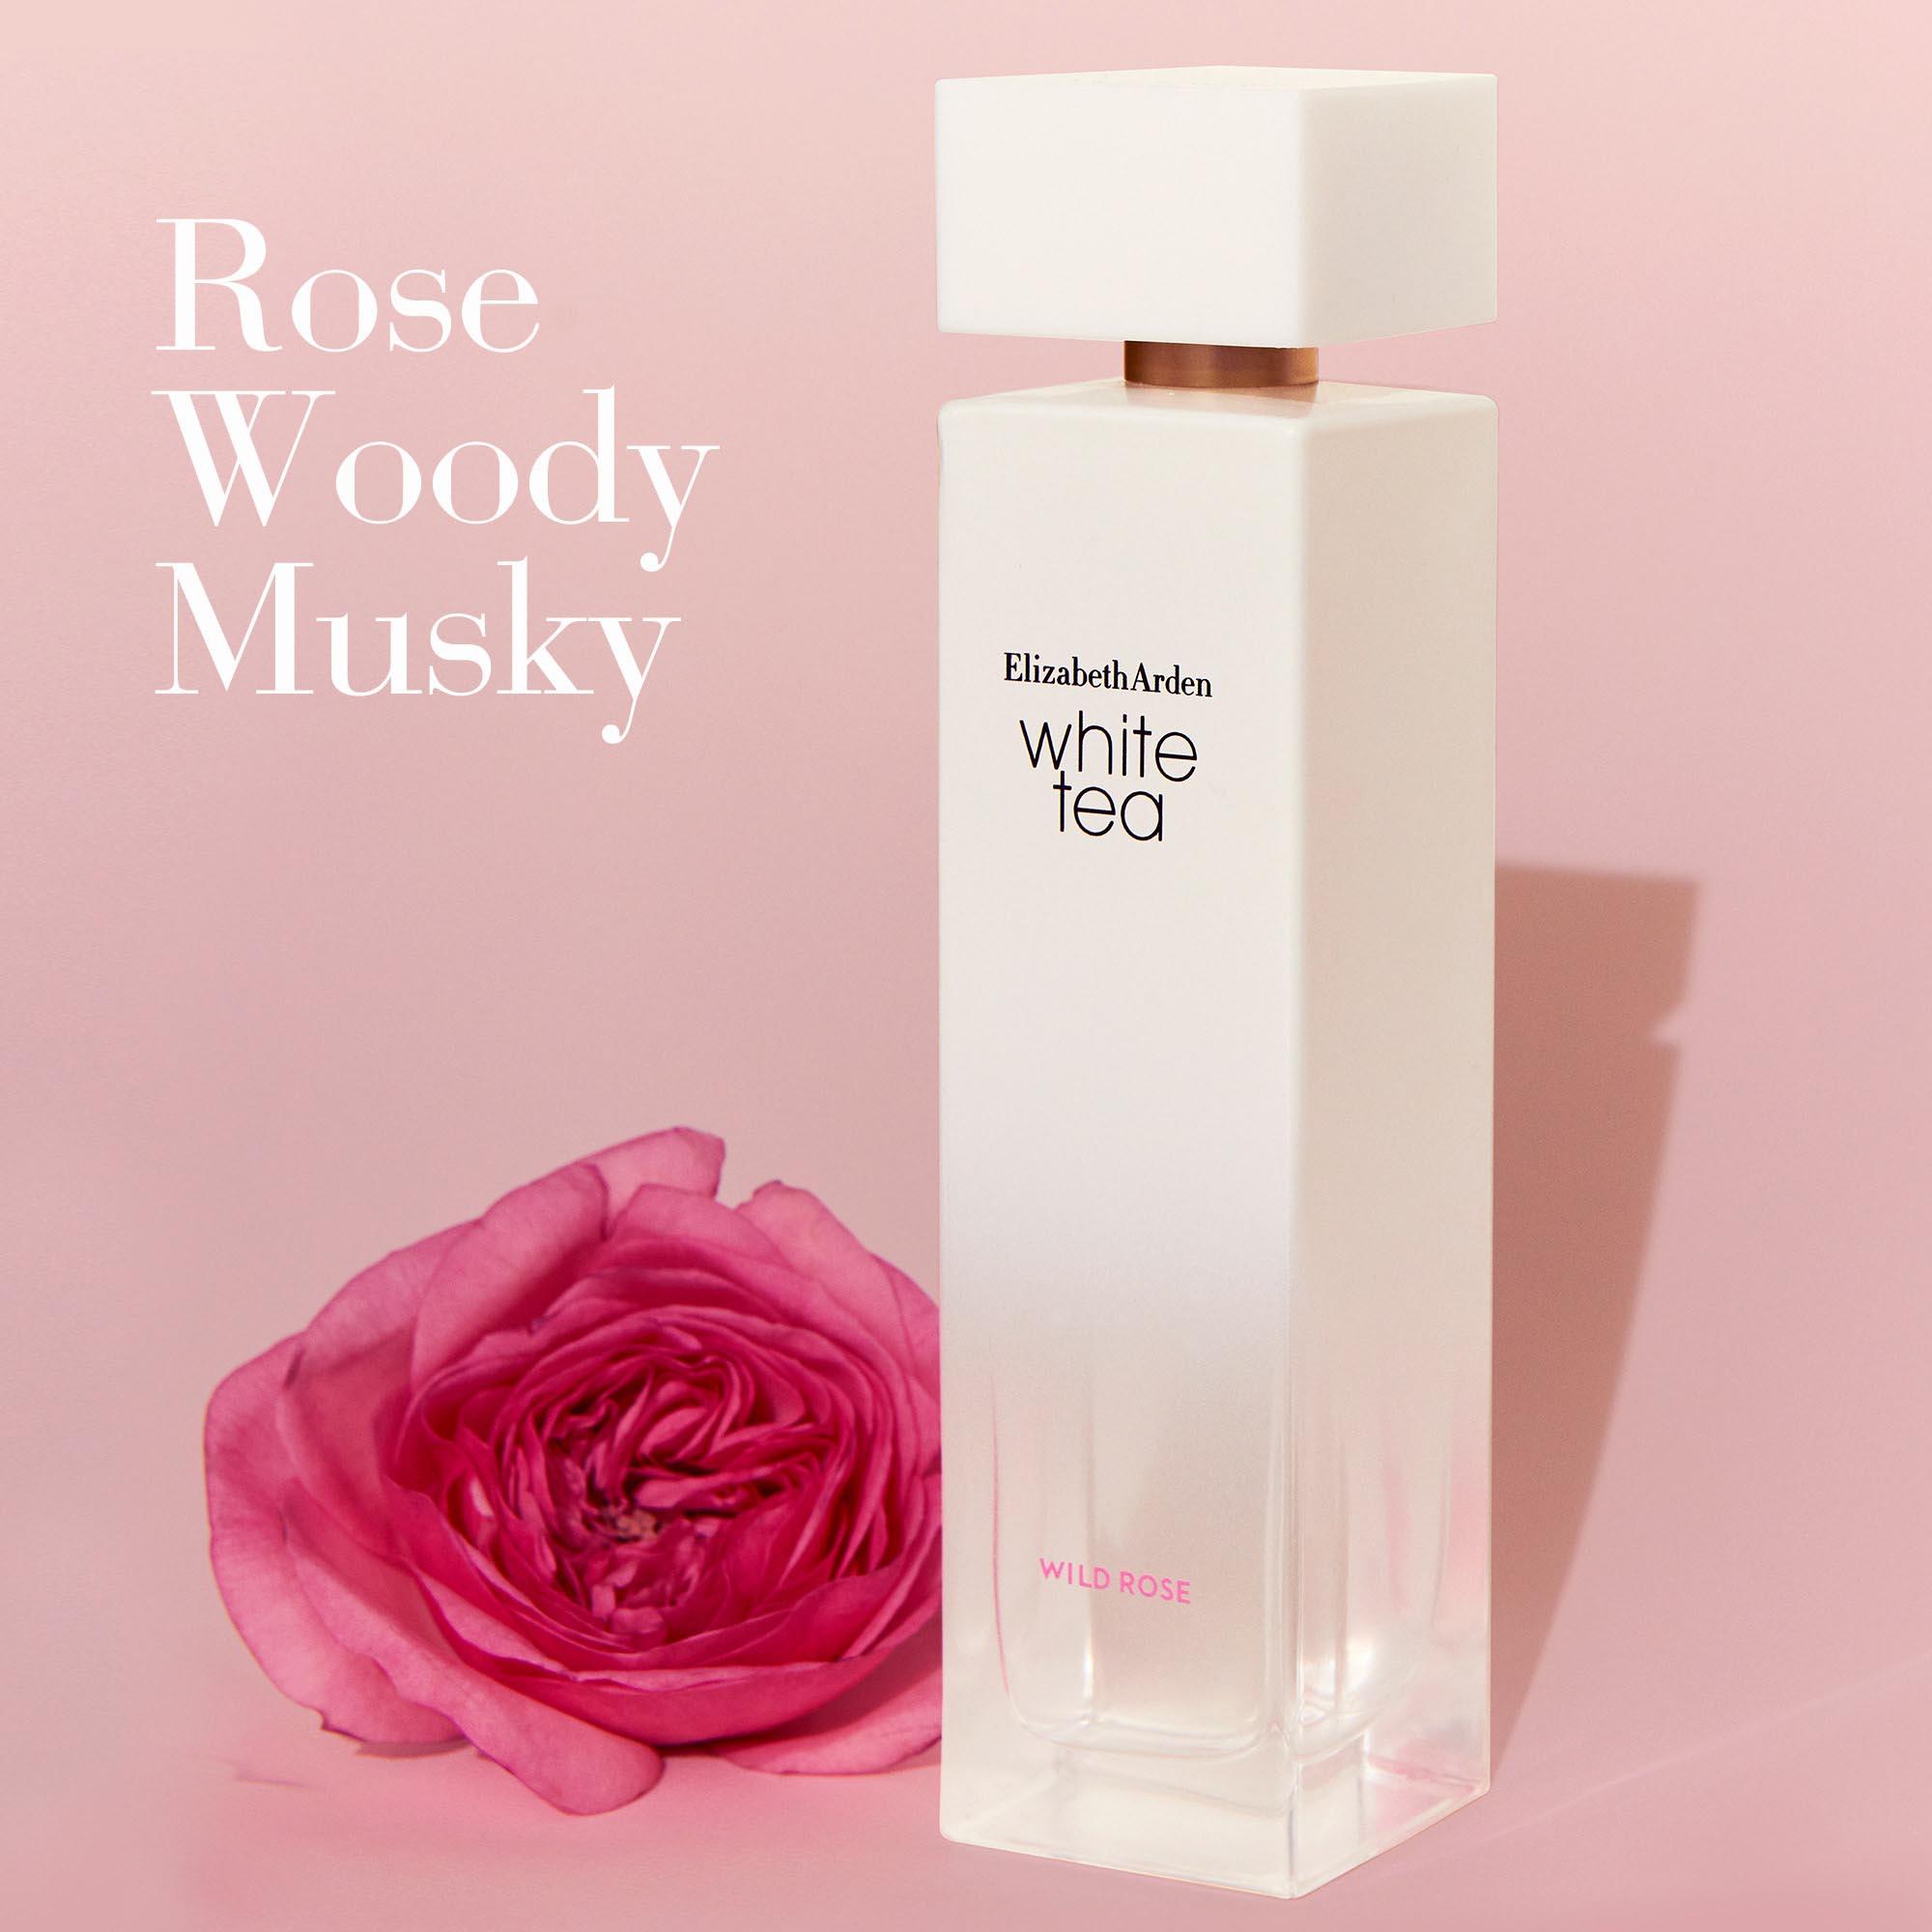 White Tea Wild Rose Scent- Rose, Woody, Musky